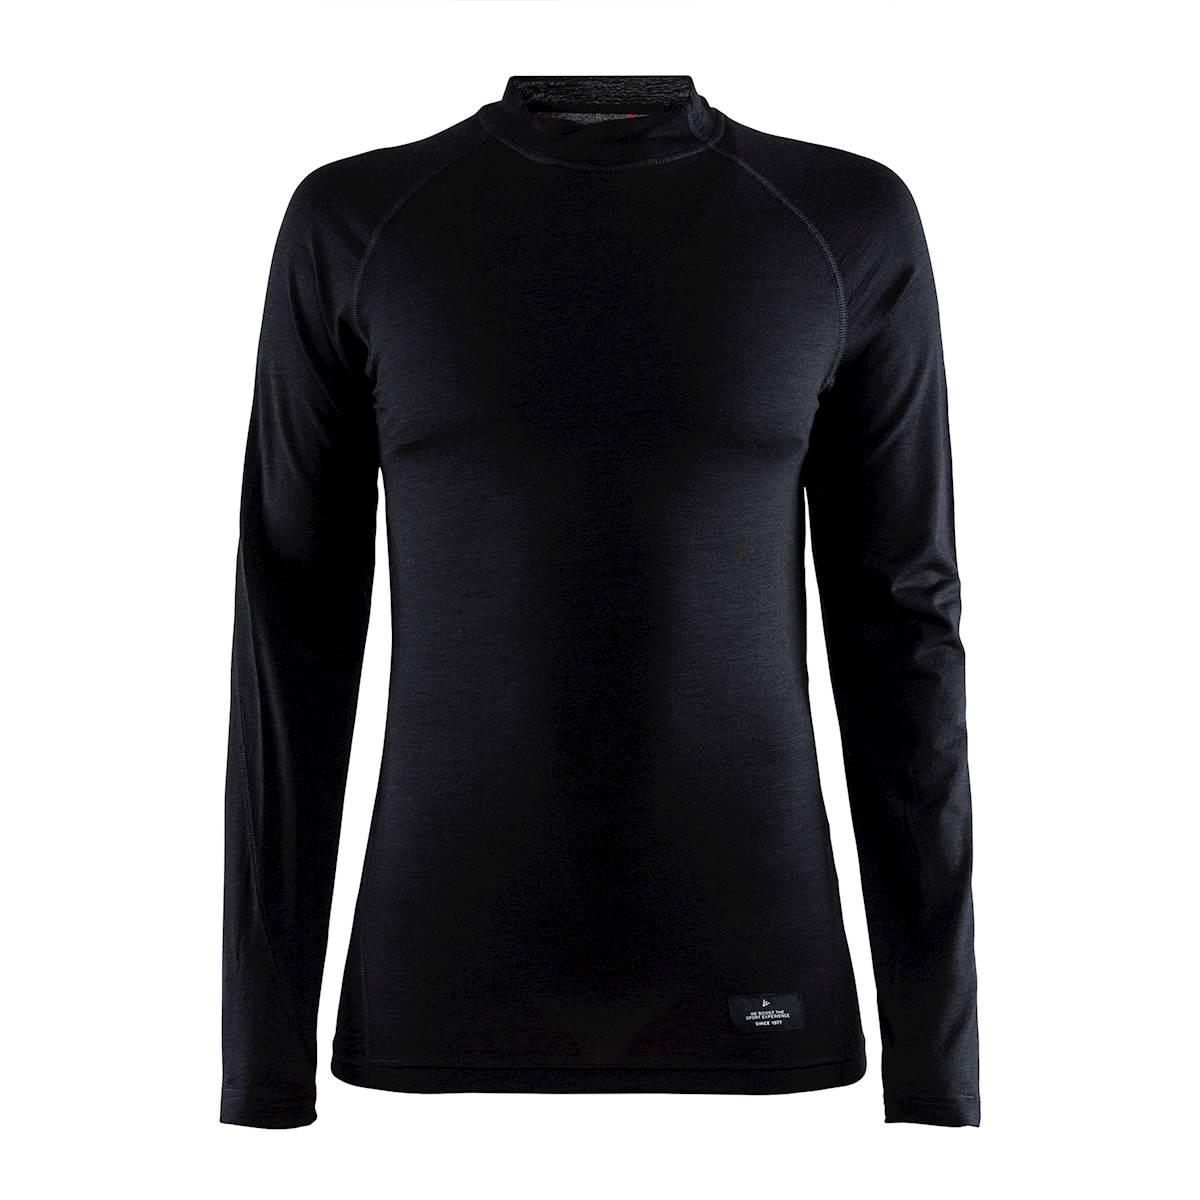 b251fb02e dámske tričko Craft Merino Lightweigh čierne [1906614 -999000 ...